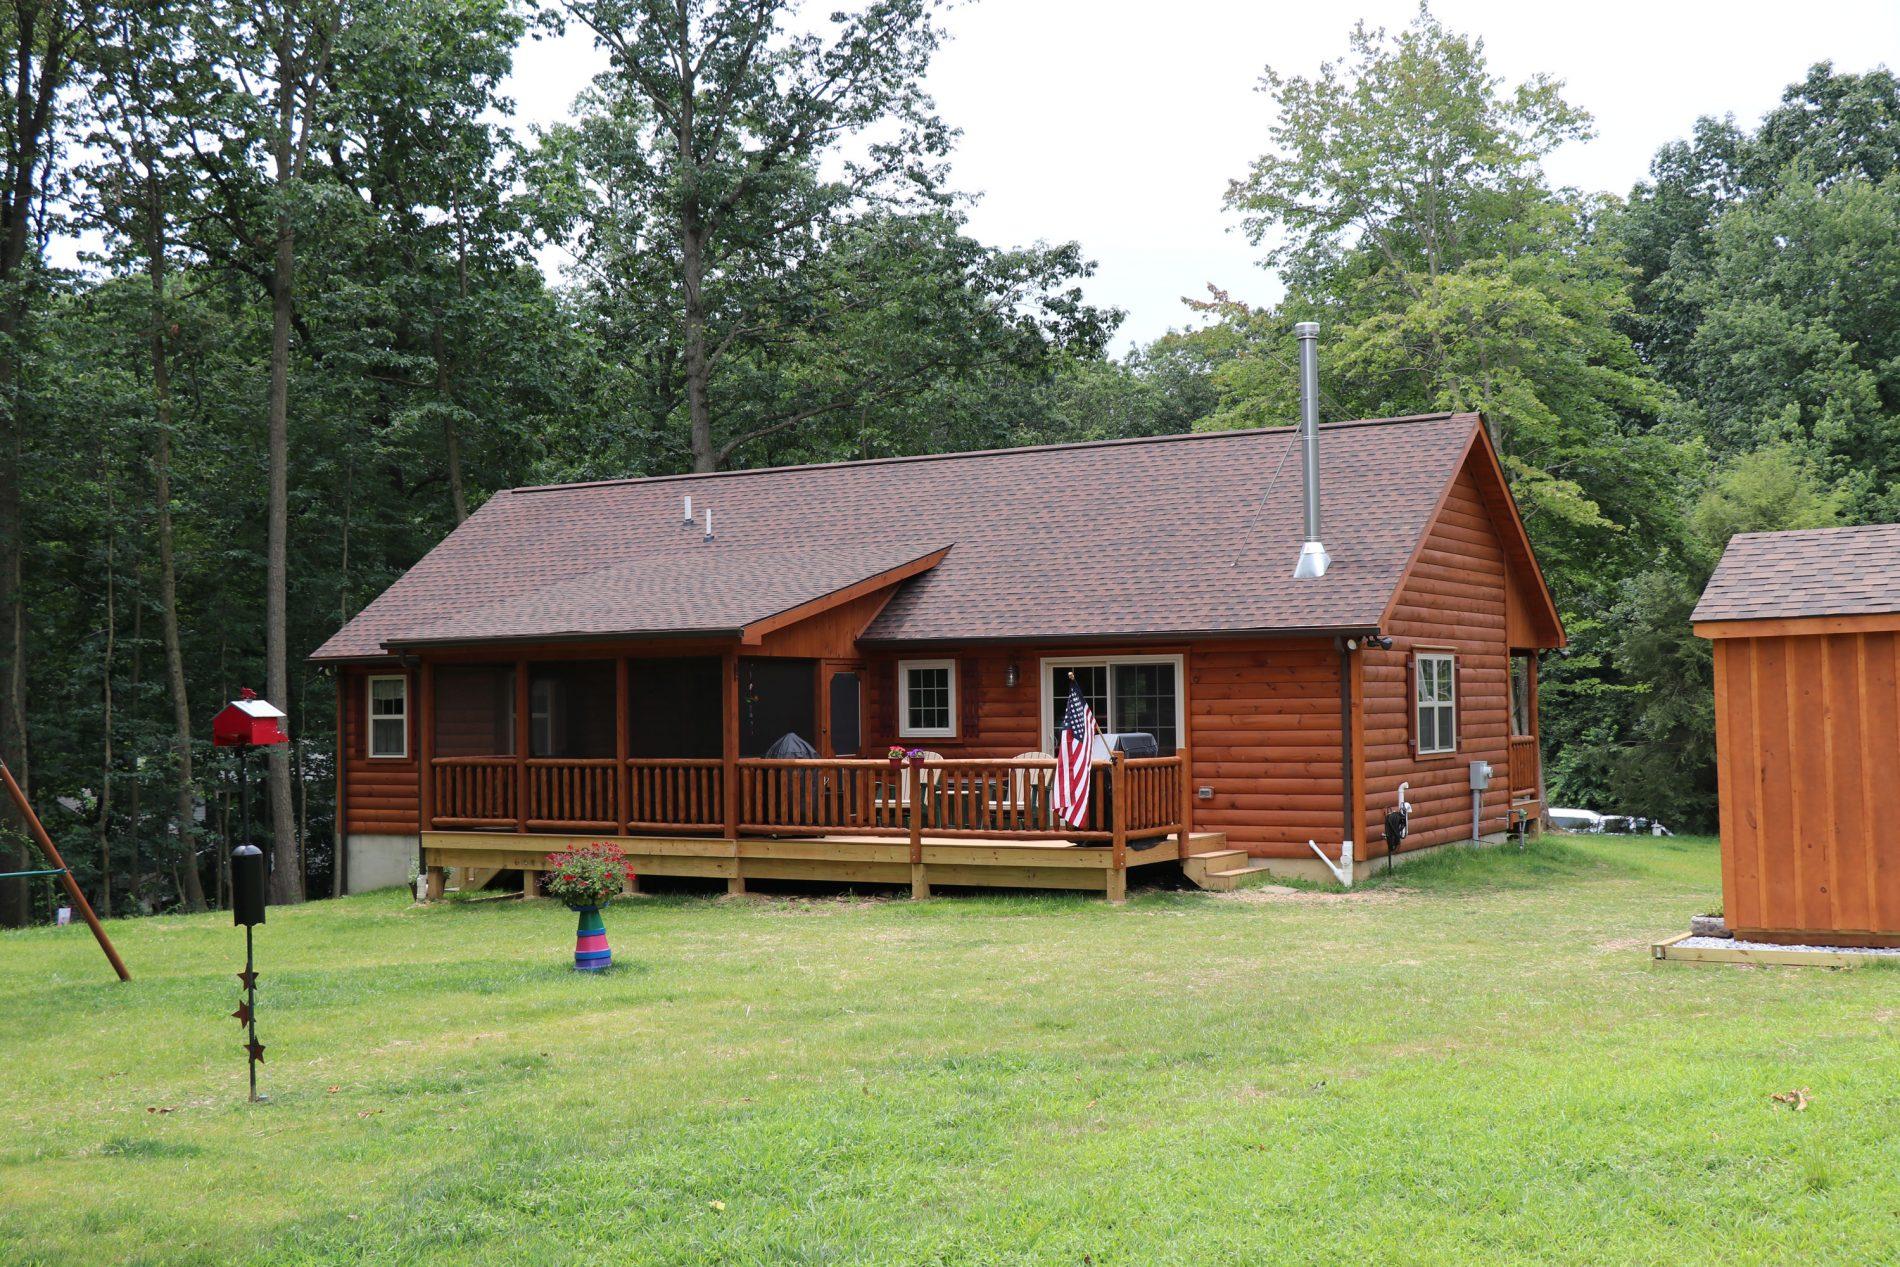 Amish Prefab Houses : Frontier cabins log cabin plans prefab floor